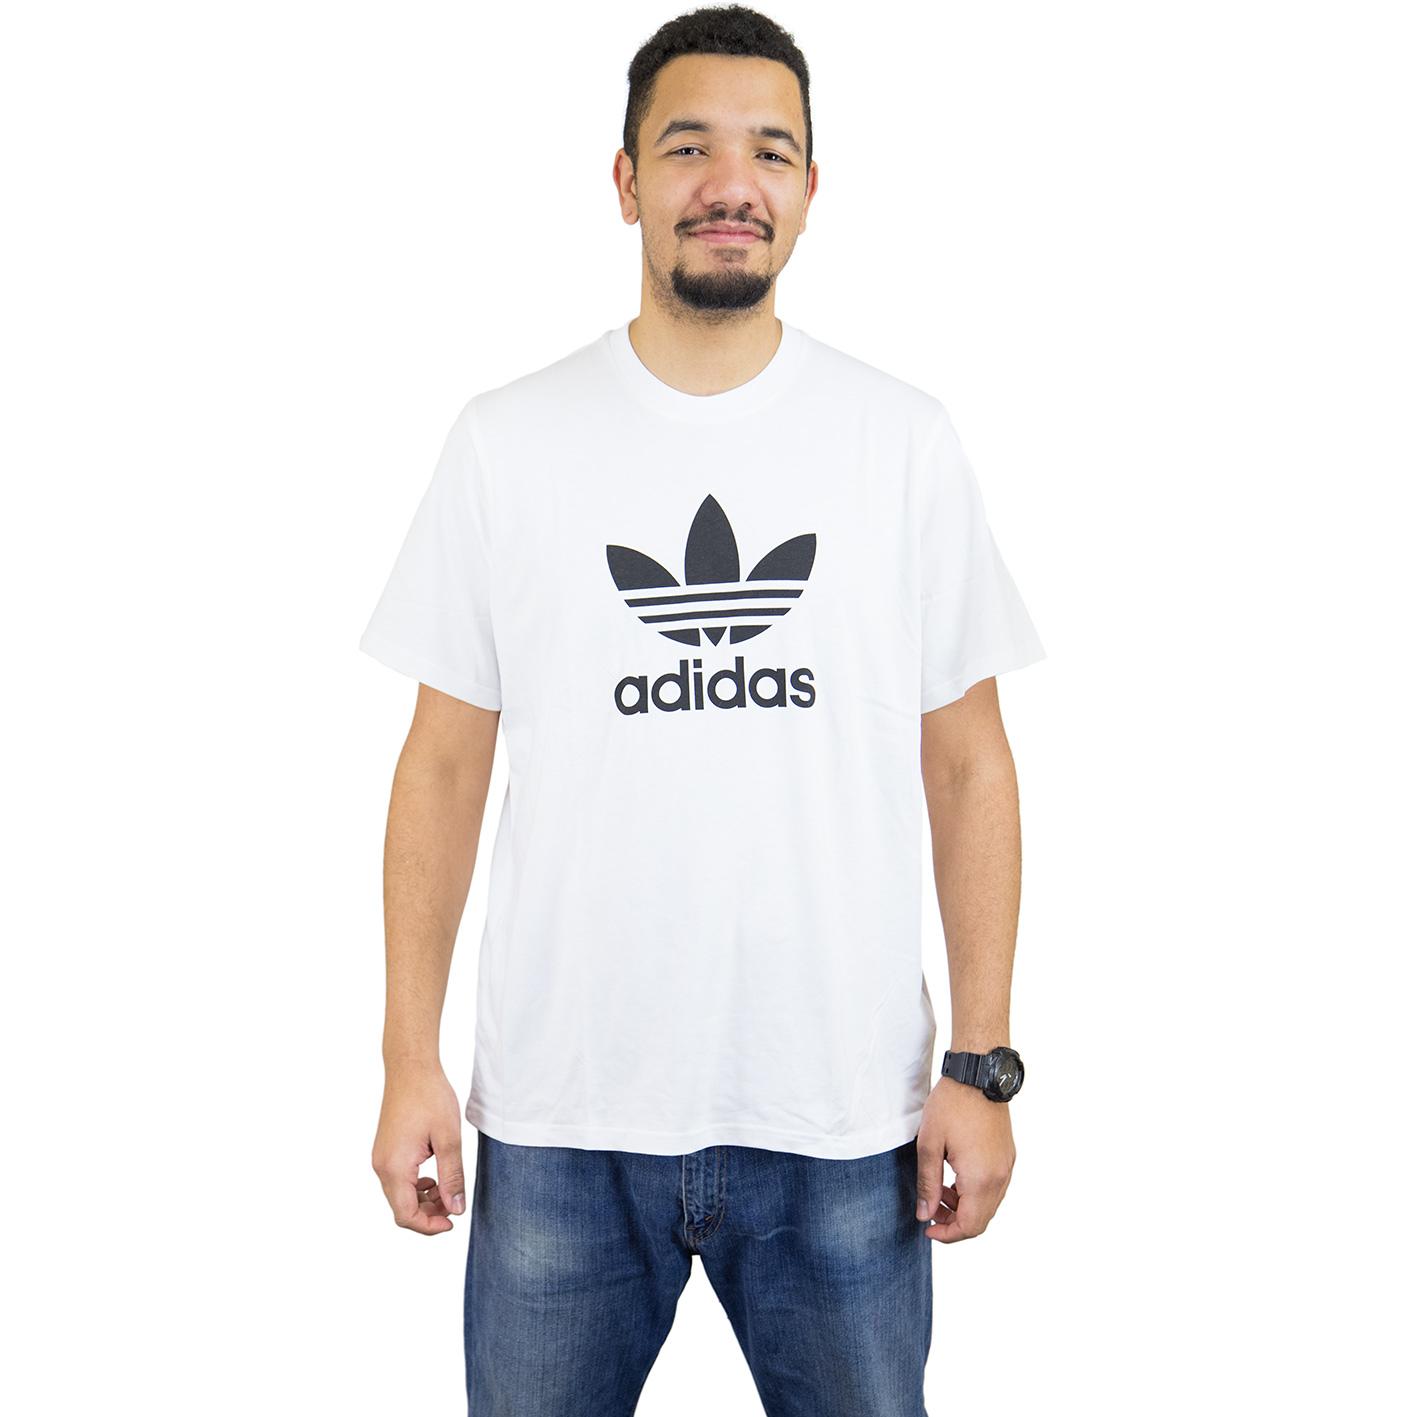 ☆ Adidas Originals T-Shirt Trefoil weiß schwarz - hier bestellen! fcd4fe2a40